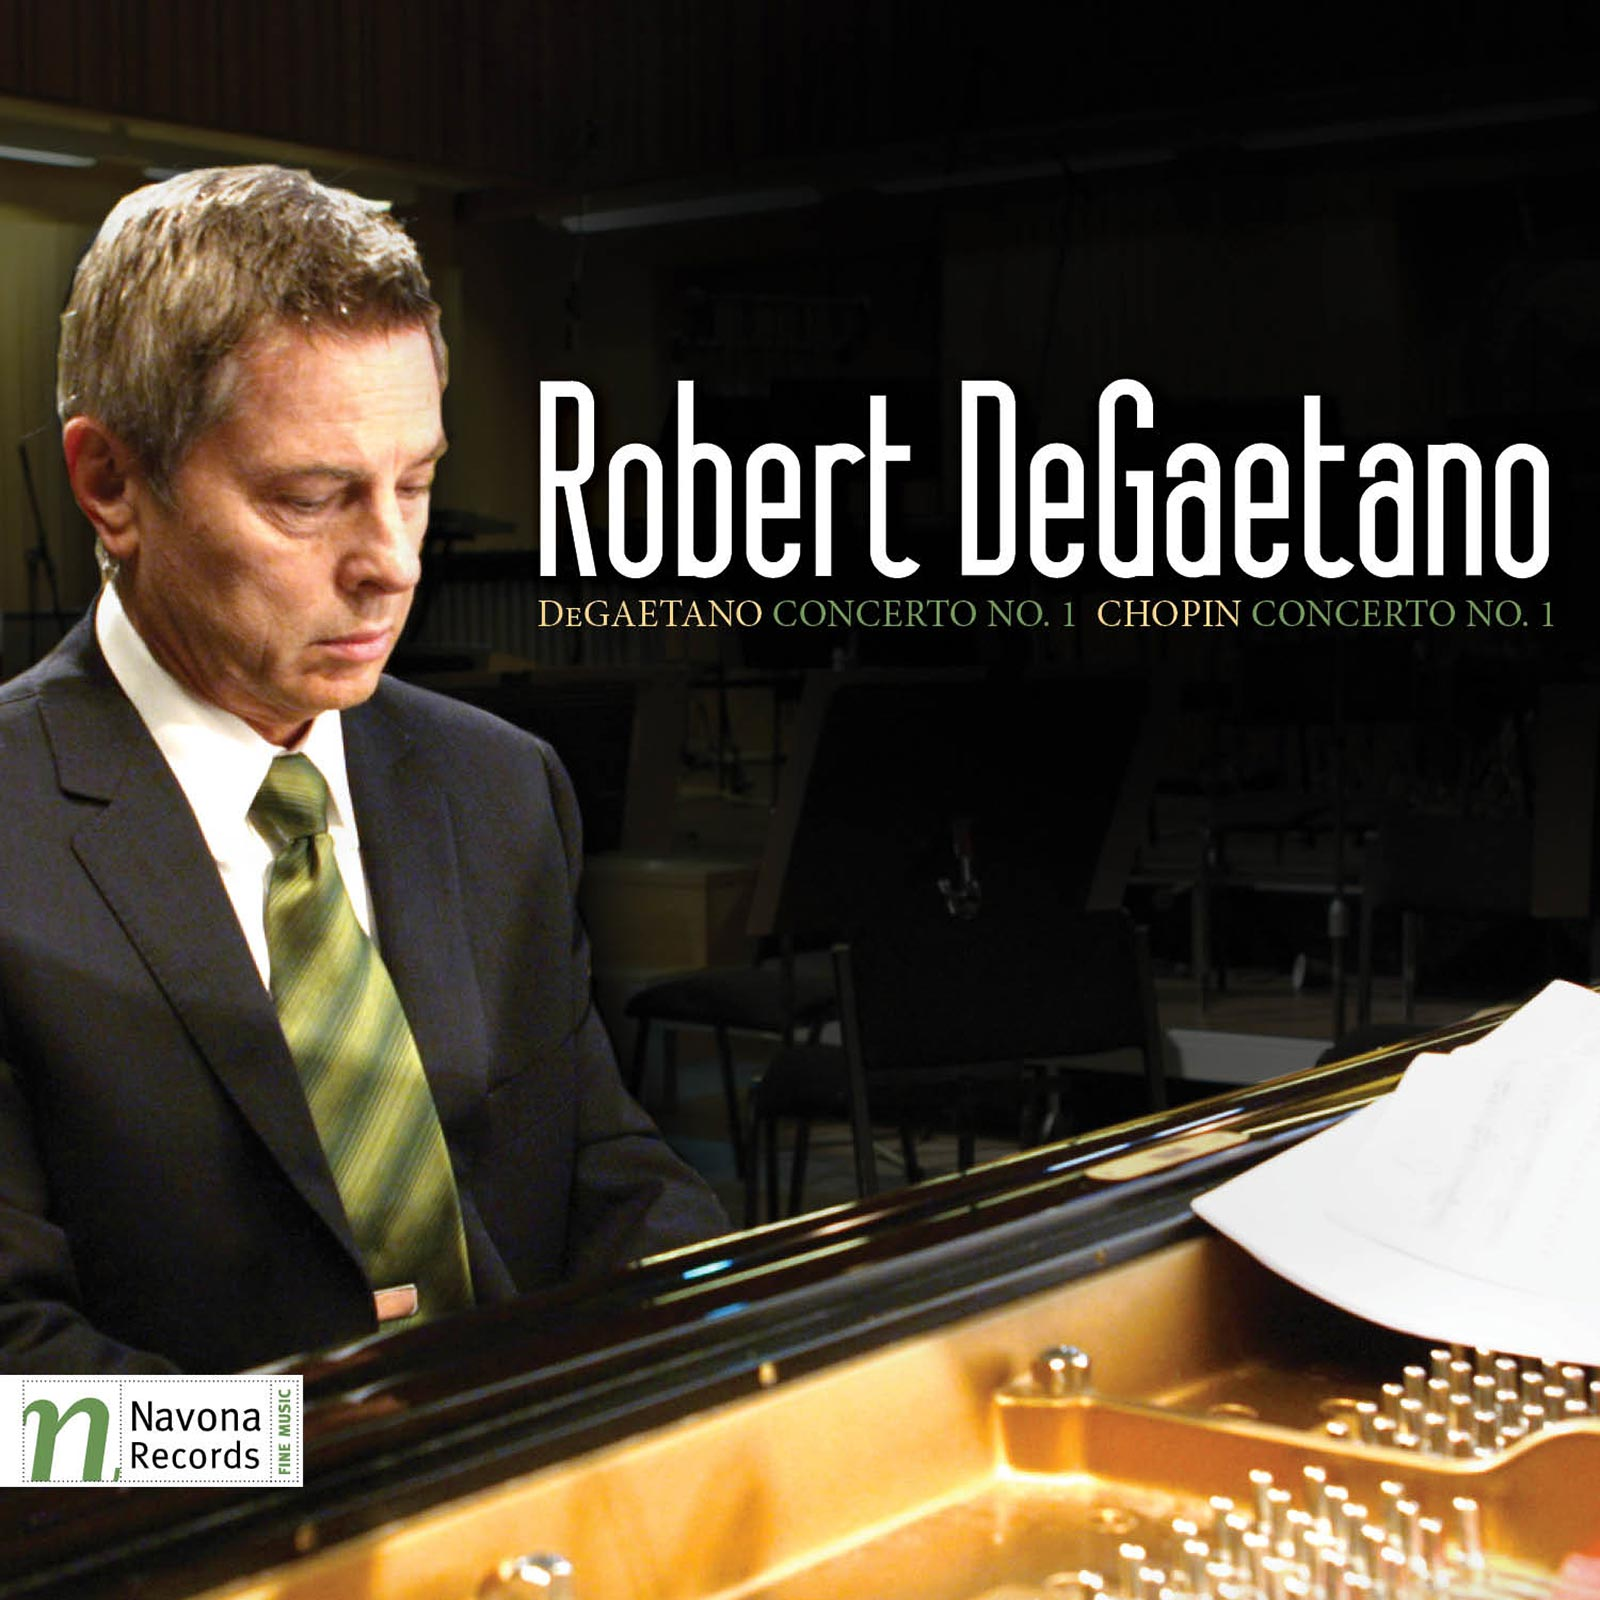 Degaetano Concerto No. 1 | Chopin Concerto No. 1